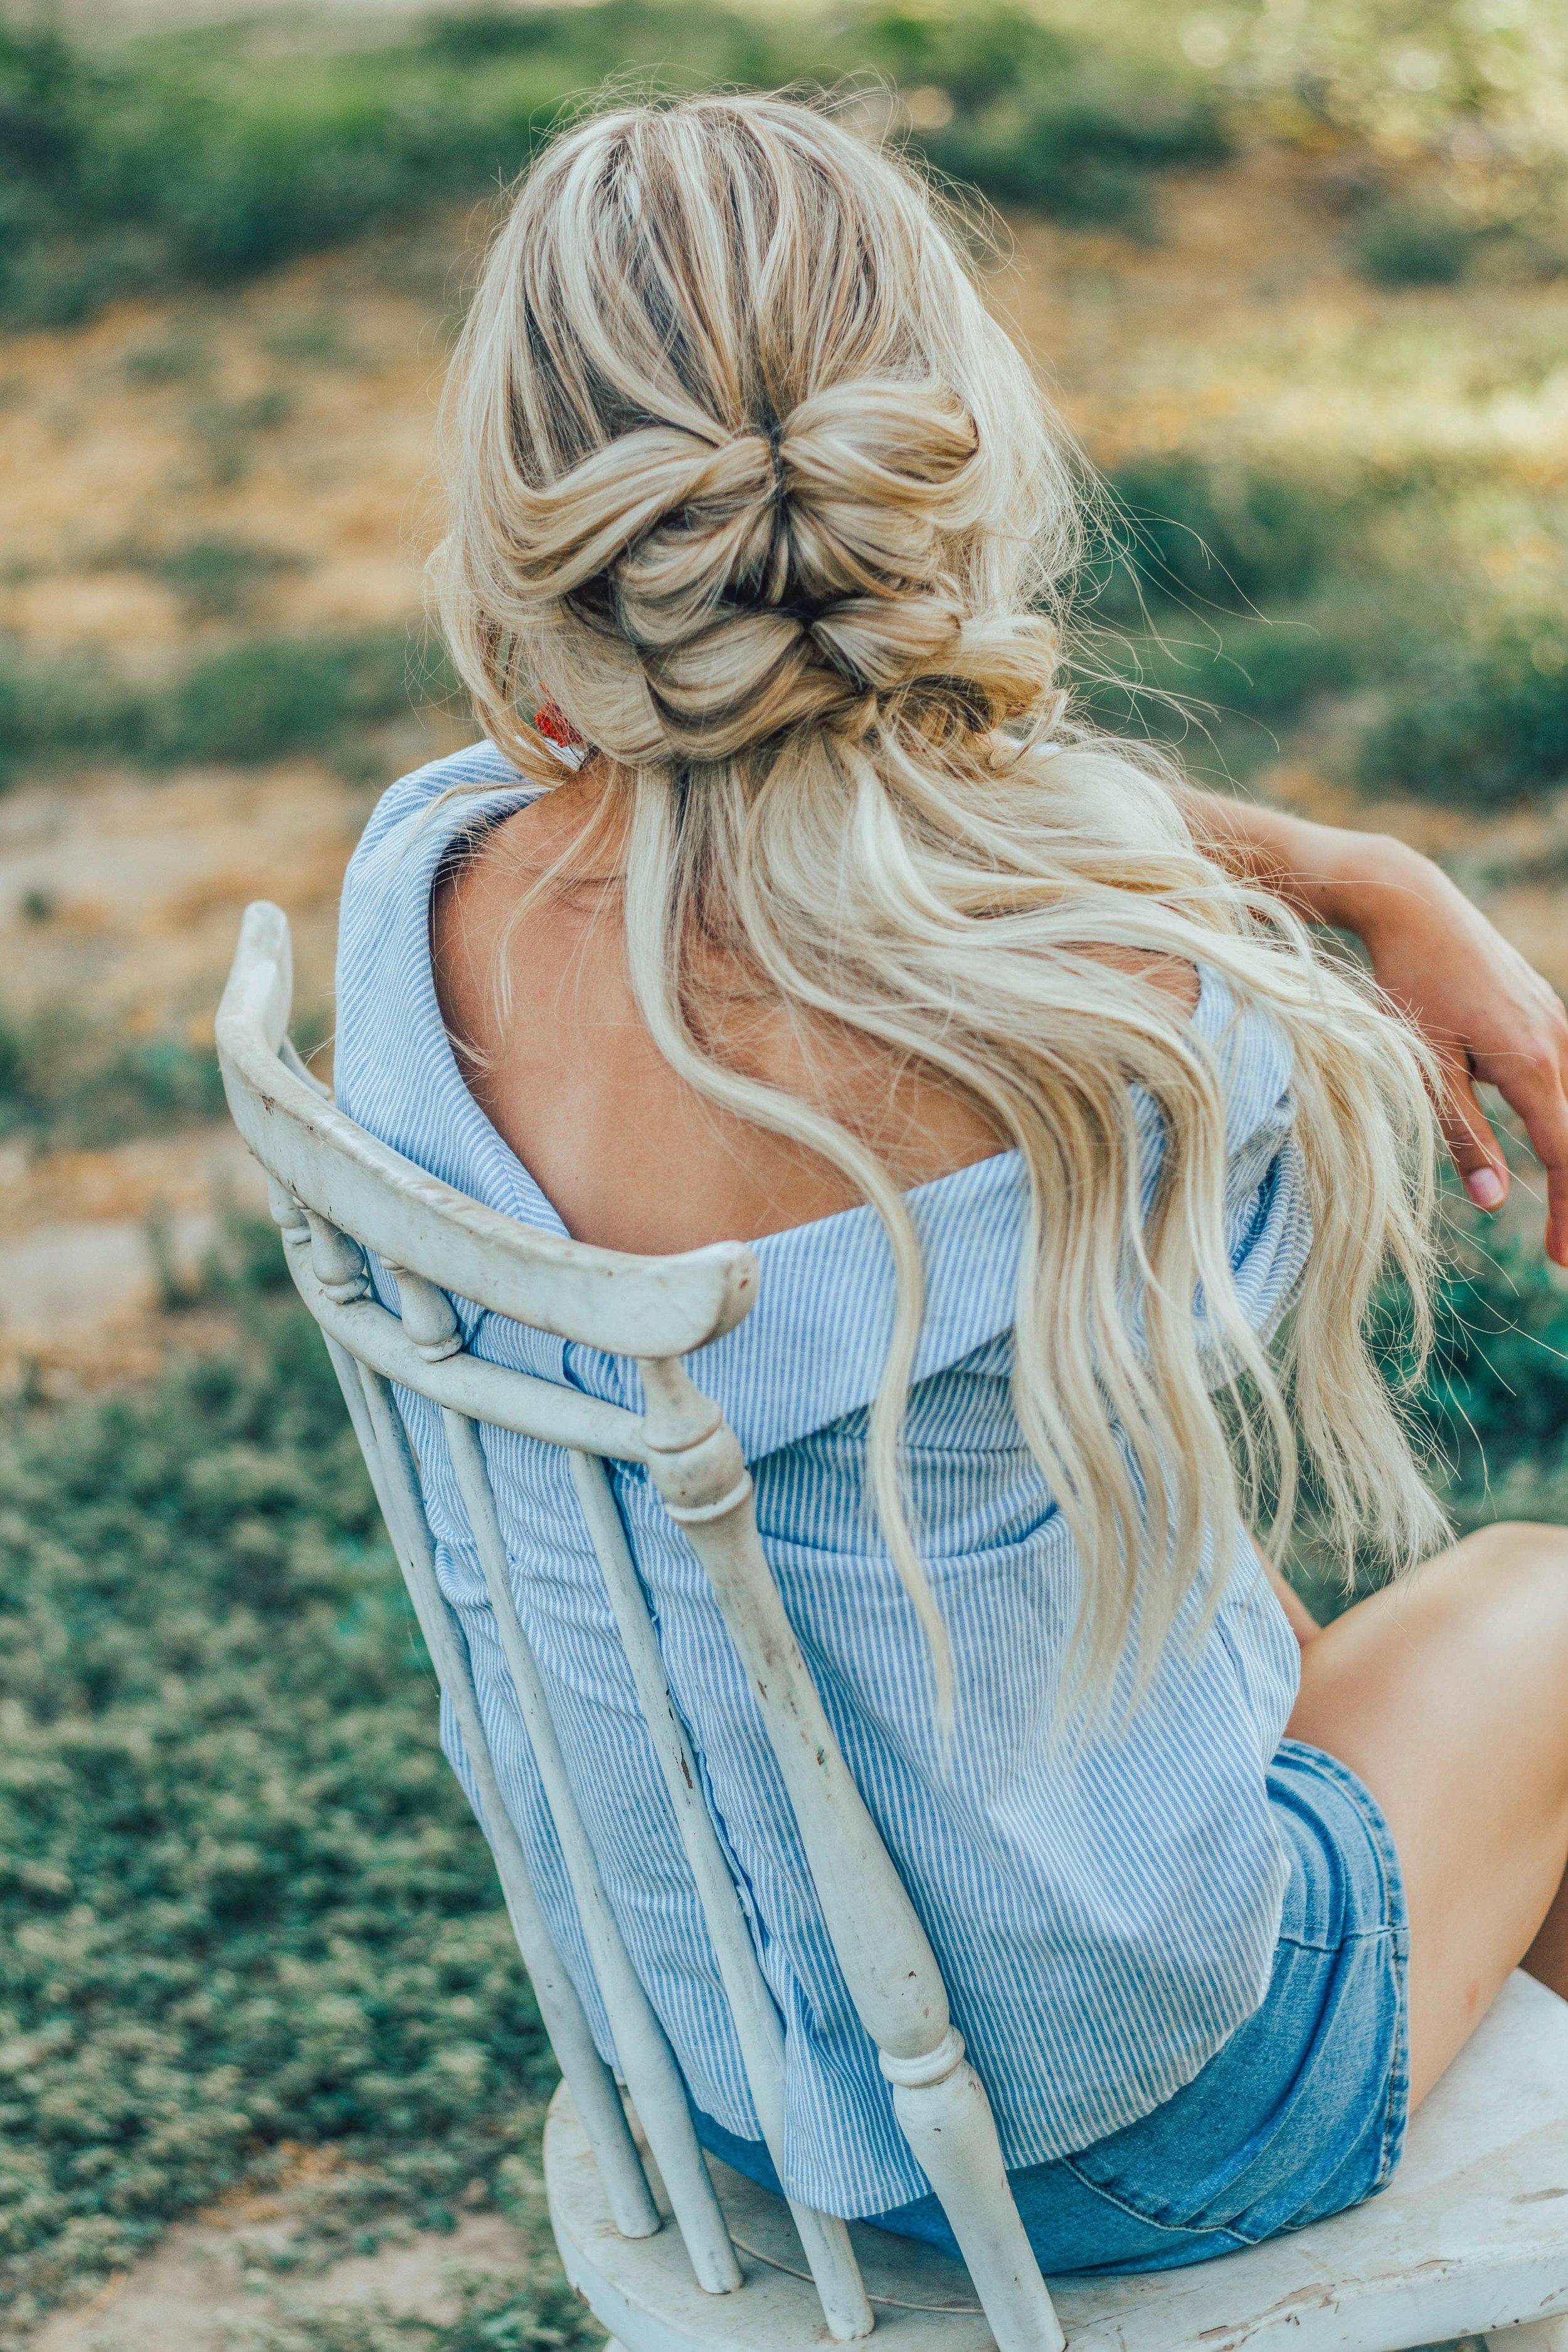 hair-style-aides-salon-Maple-Grove.jpg